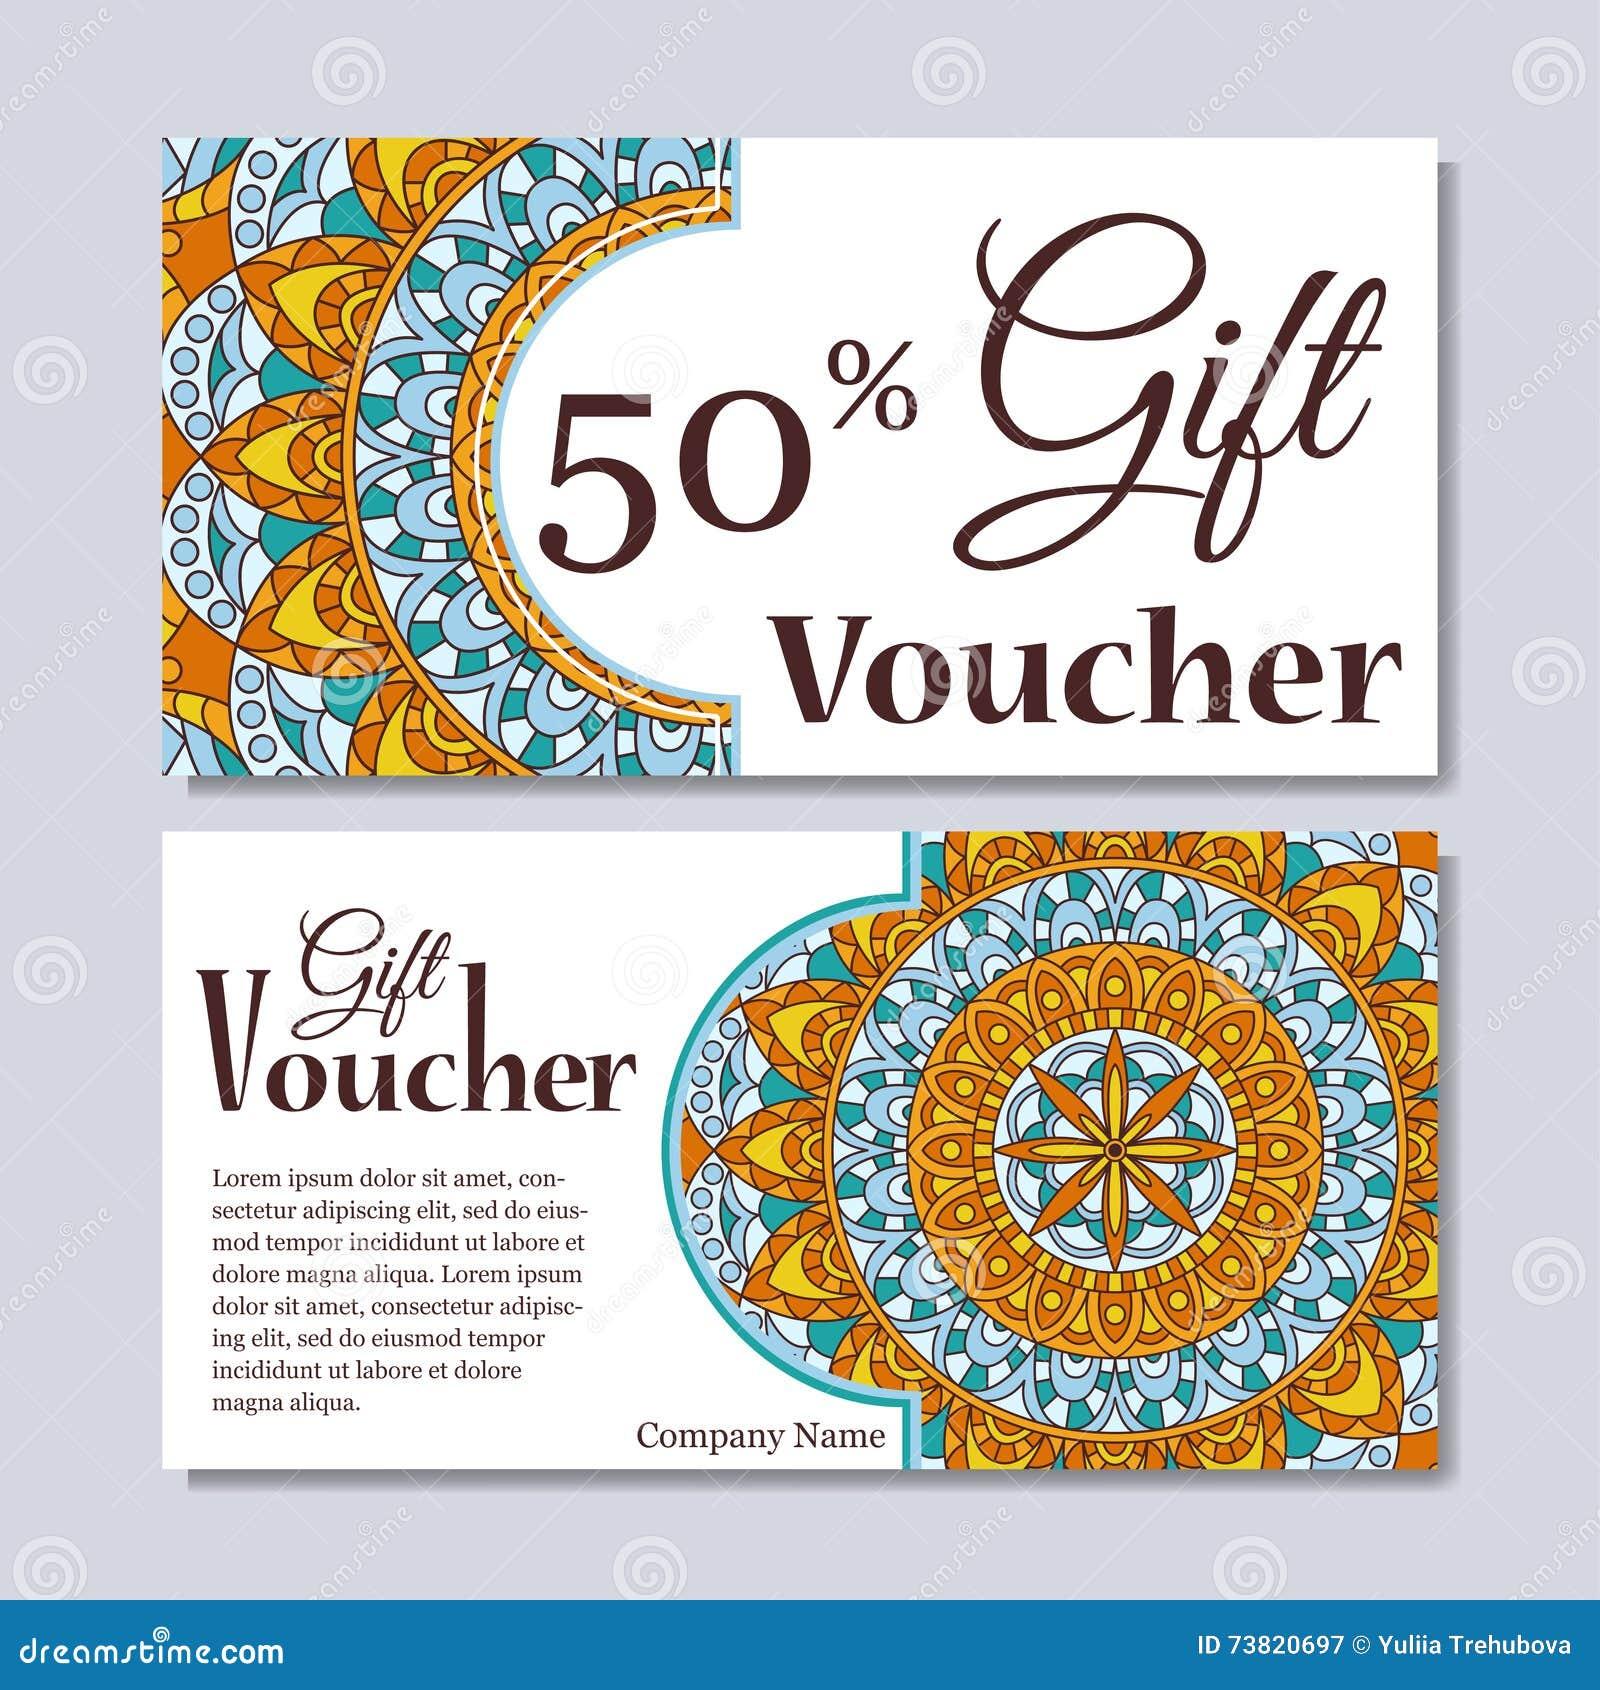 Magazine discount center coupon